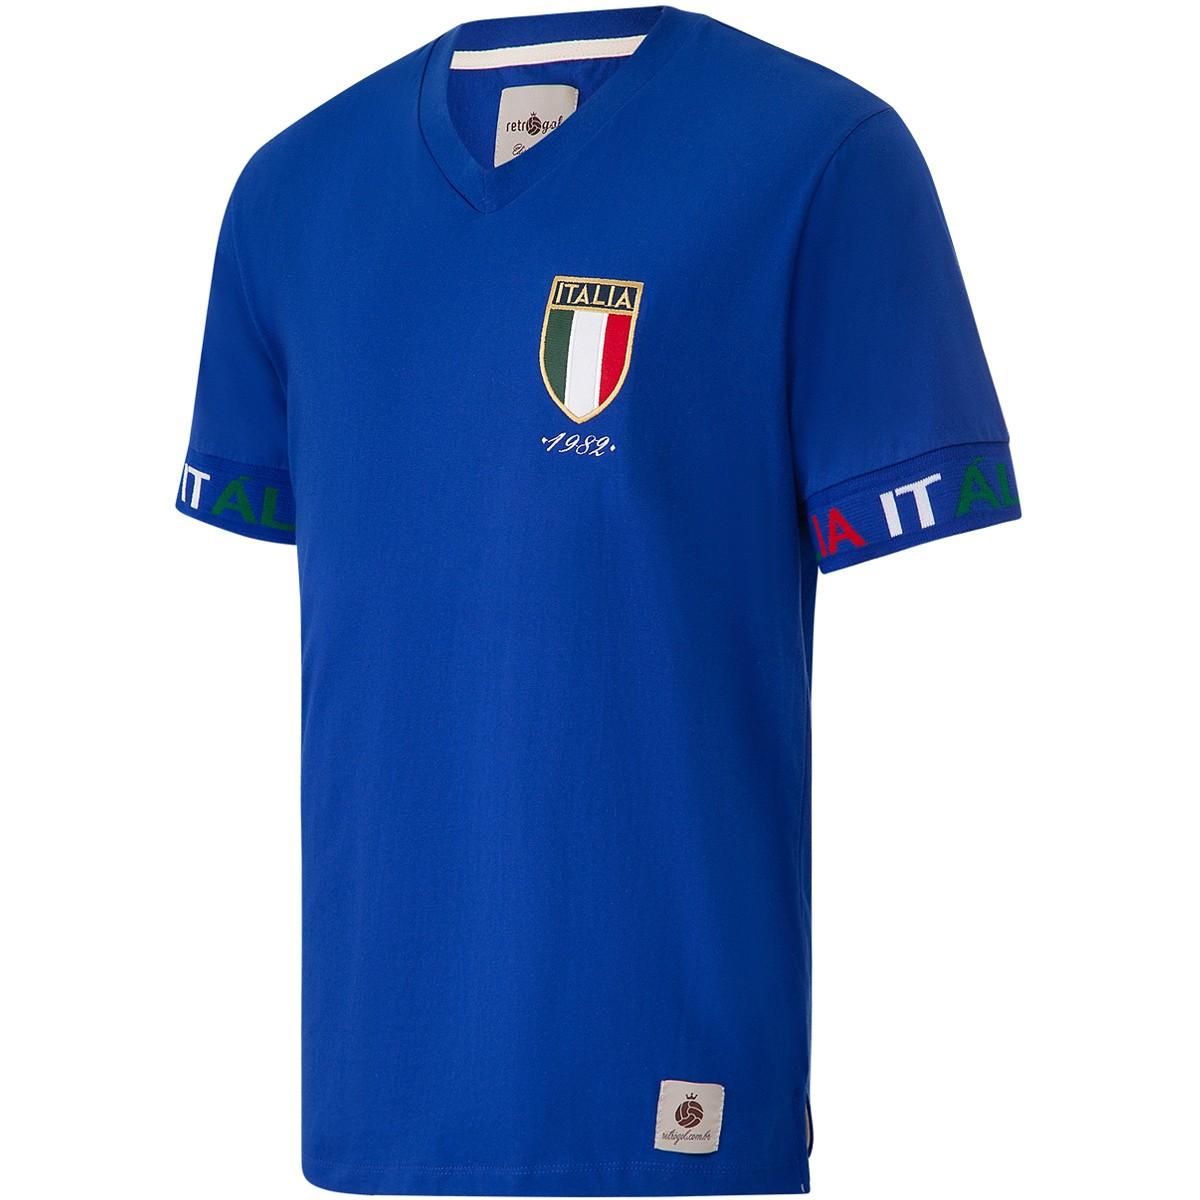 Camisa Itália Retrô Sleeve Masculina